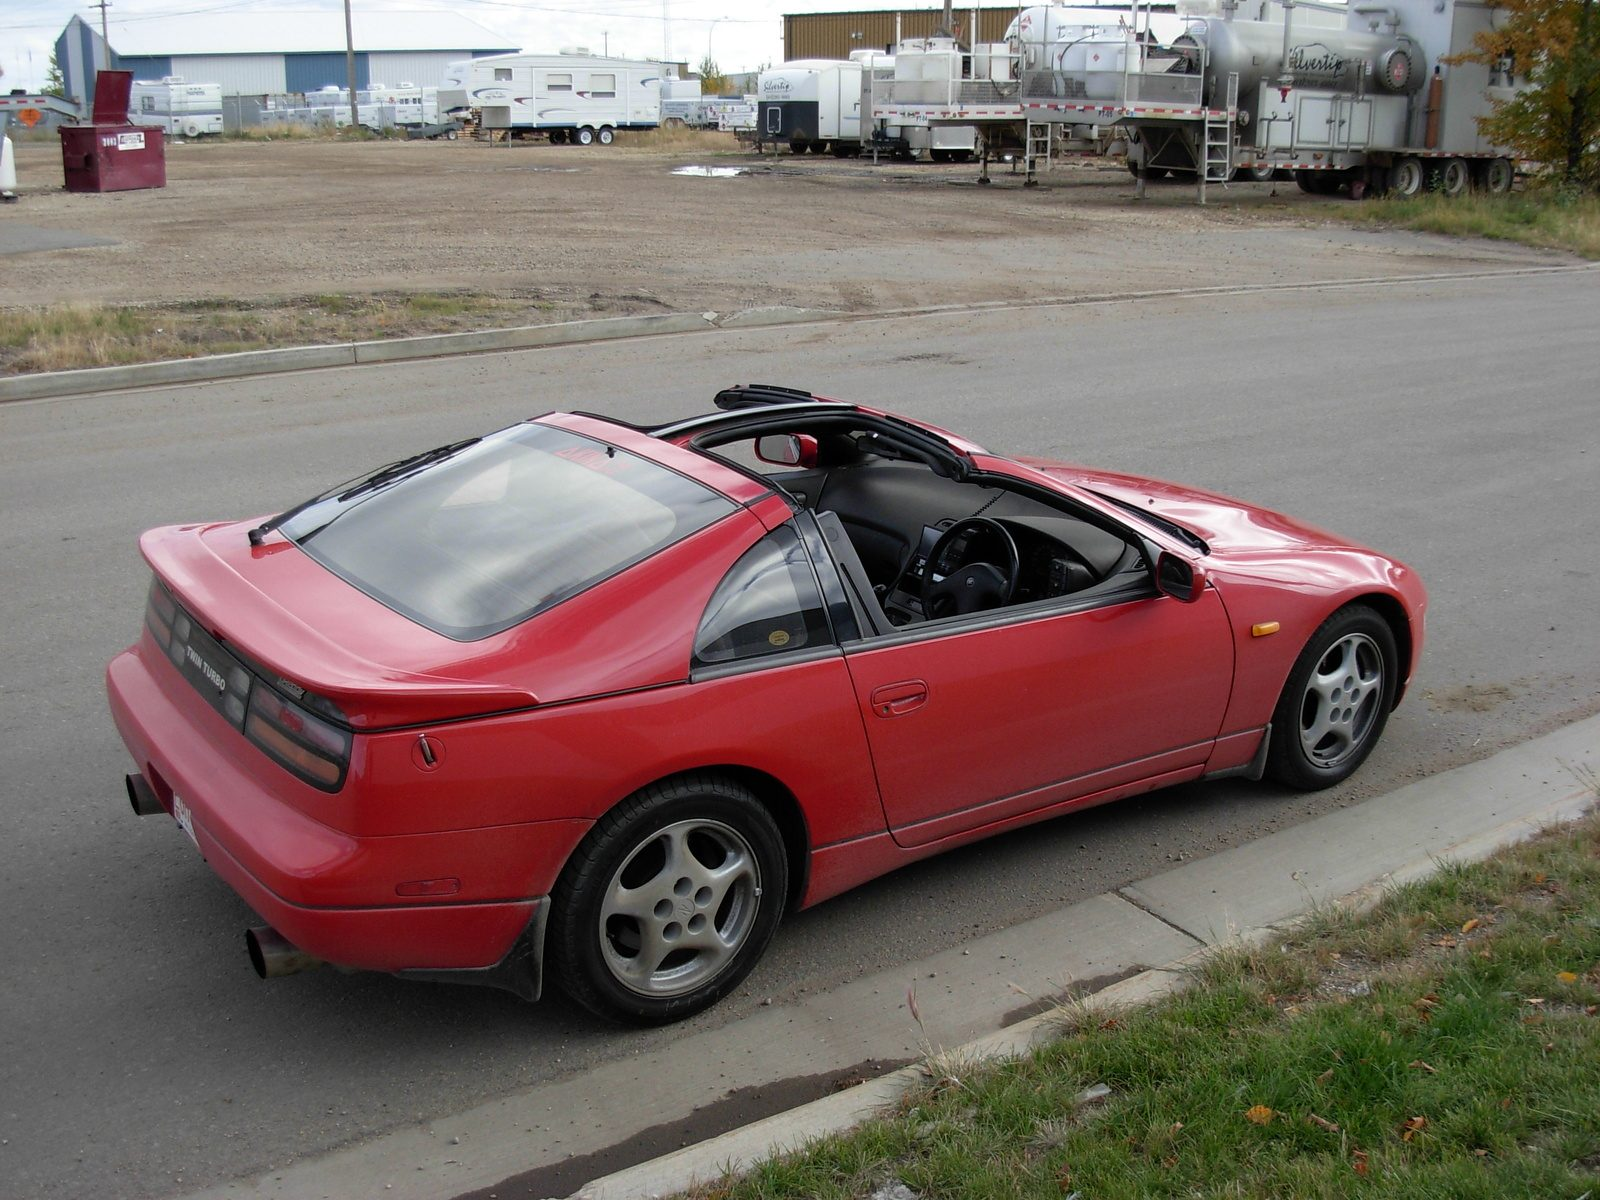 5 Best Rwd Cars Under 10k